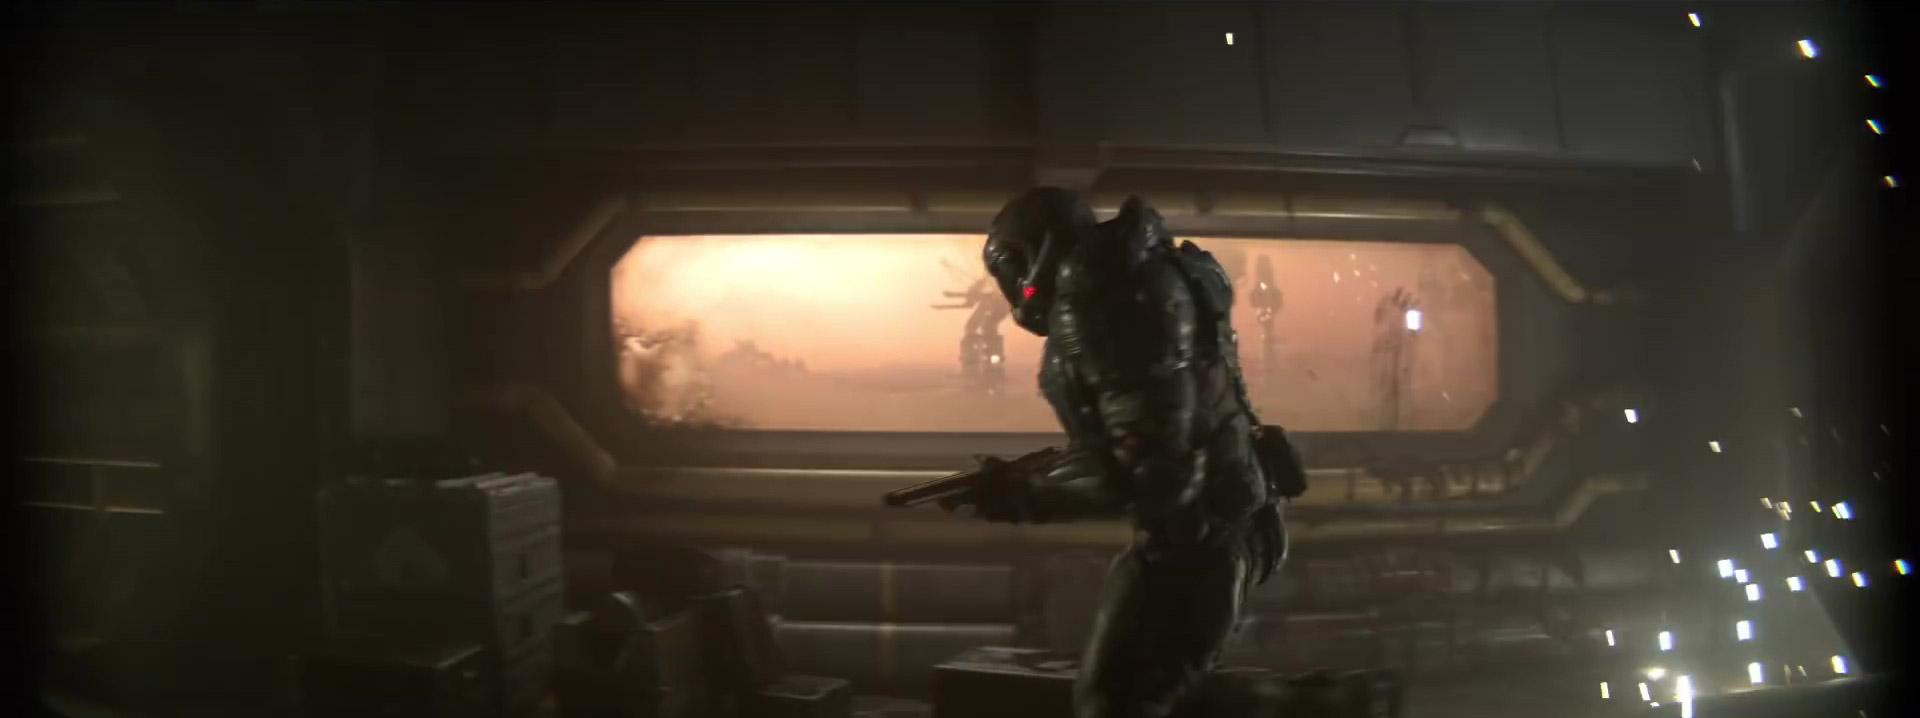 doom-2016-video-game-trailer-4